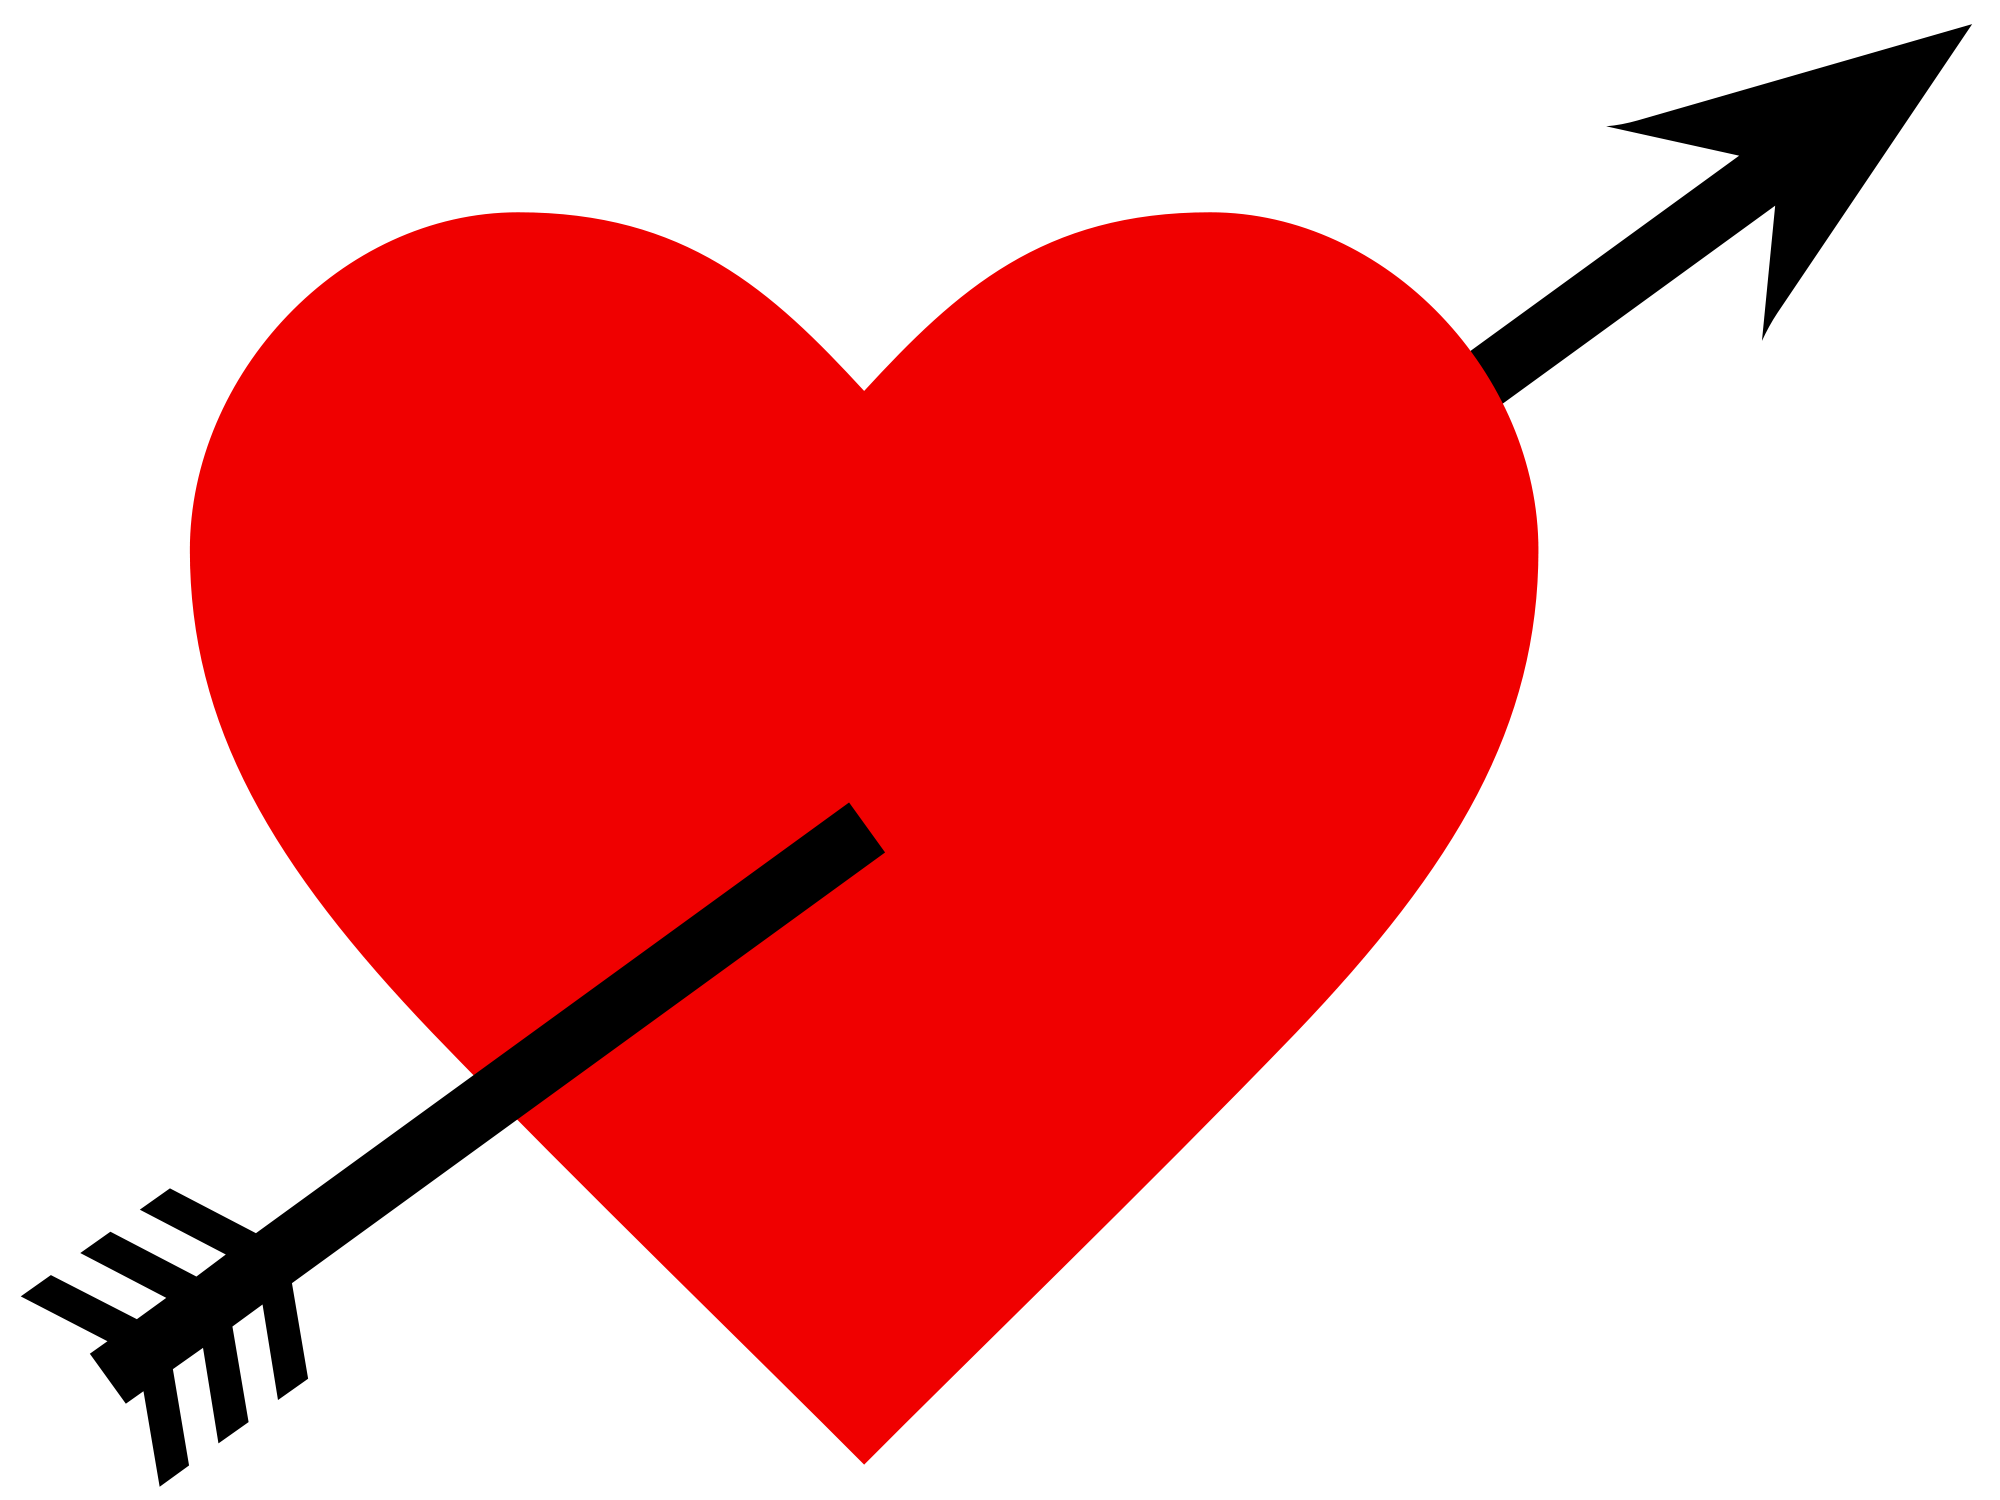 Free Arrow Heart Png, Download Free Clip Art, Free Clip Art.